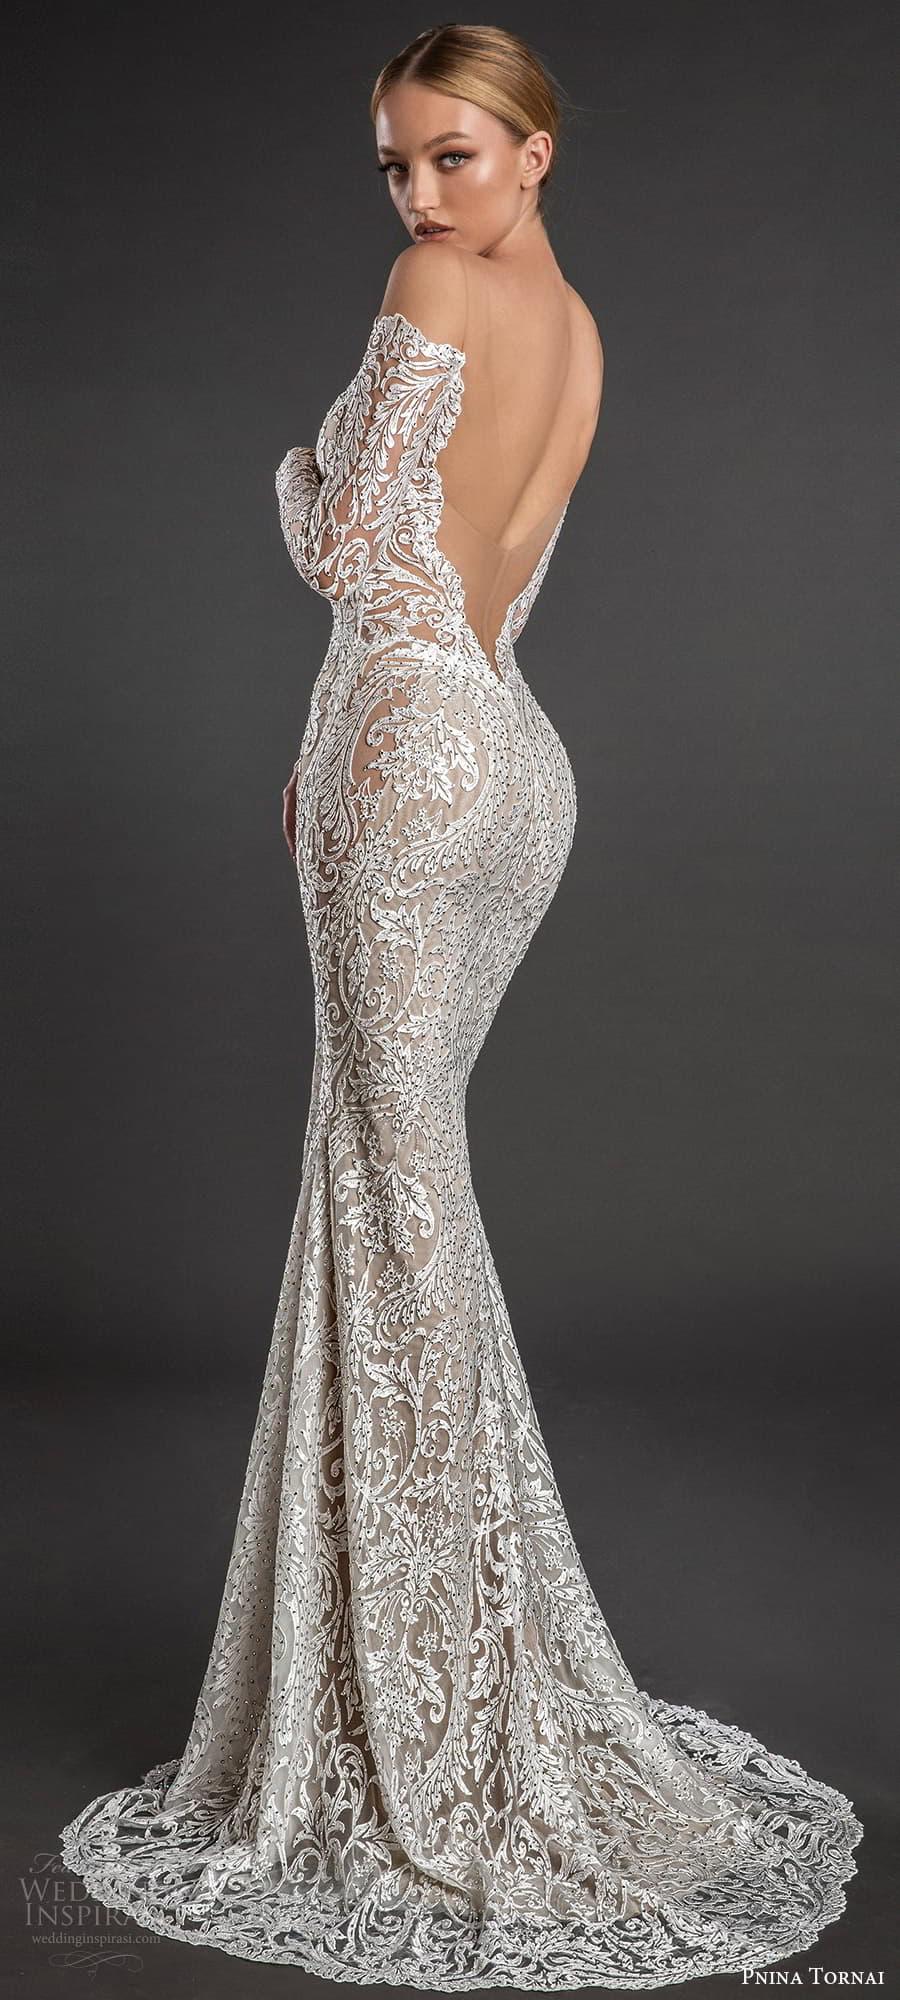 pnina tornai 2022 love bridal long sleeve off shoulder sweetheart neckline fully embellished lace sheath wedding dress chapel train (2) bv